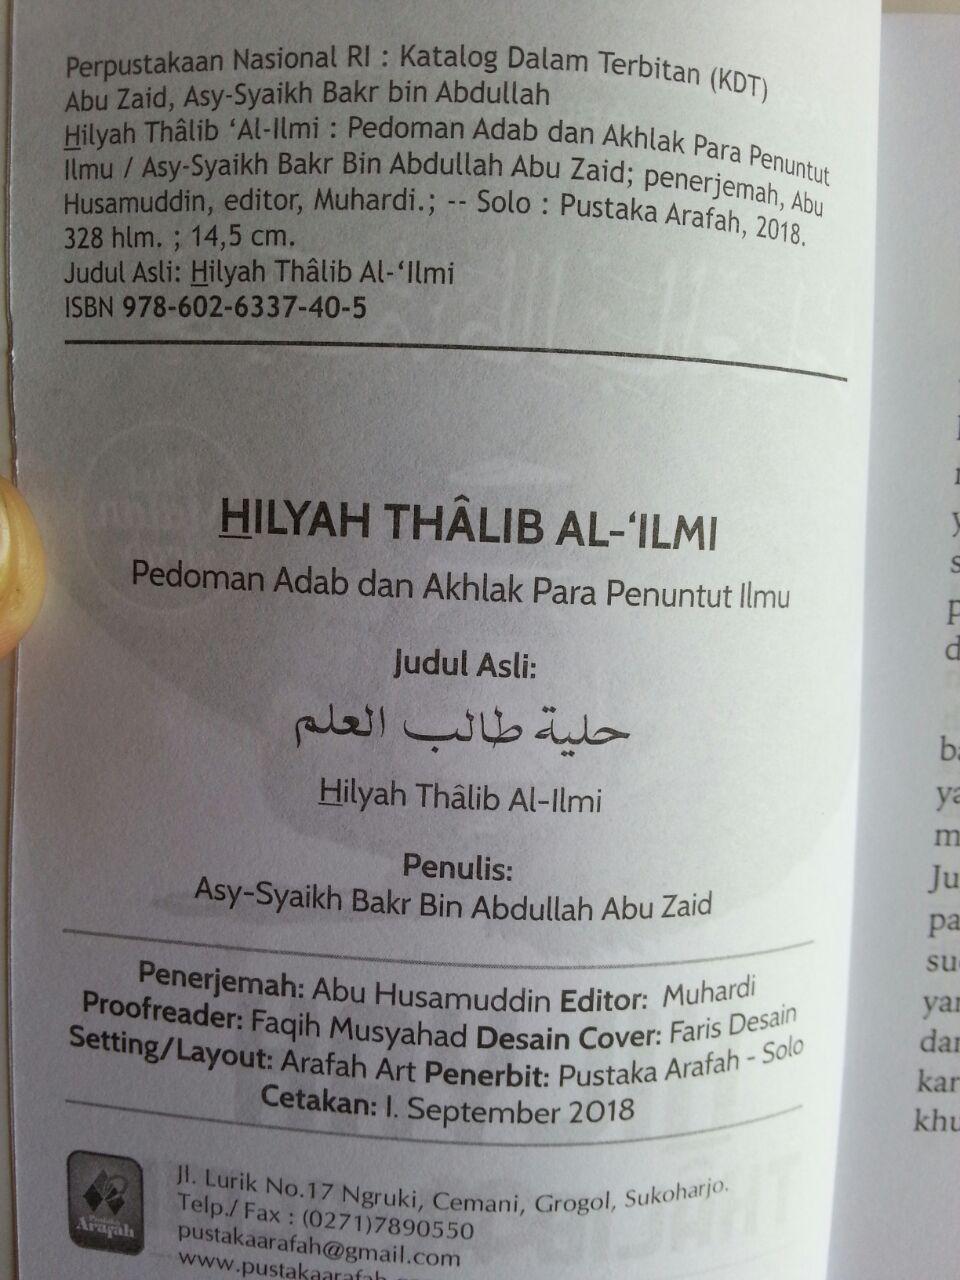 Buku Hilyah Thalib Al-Ilmi Pedoman Adab Akhlak Penuntut Ilmu isi 2